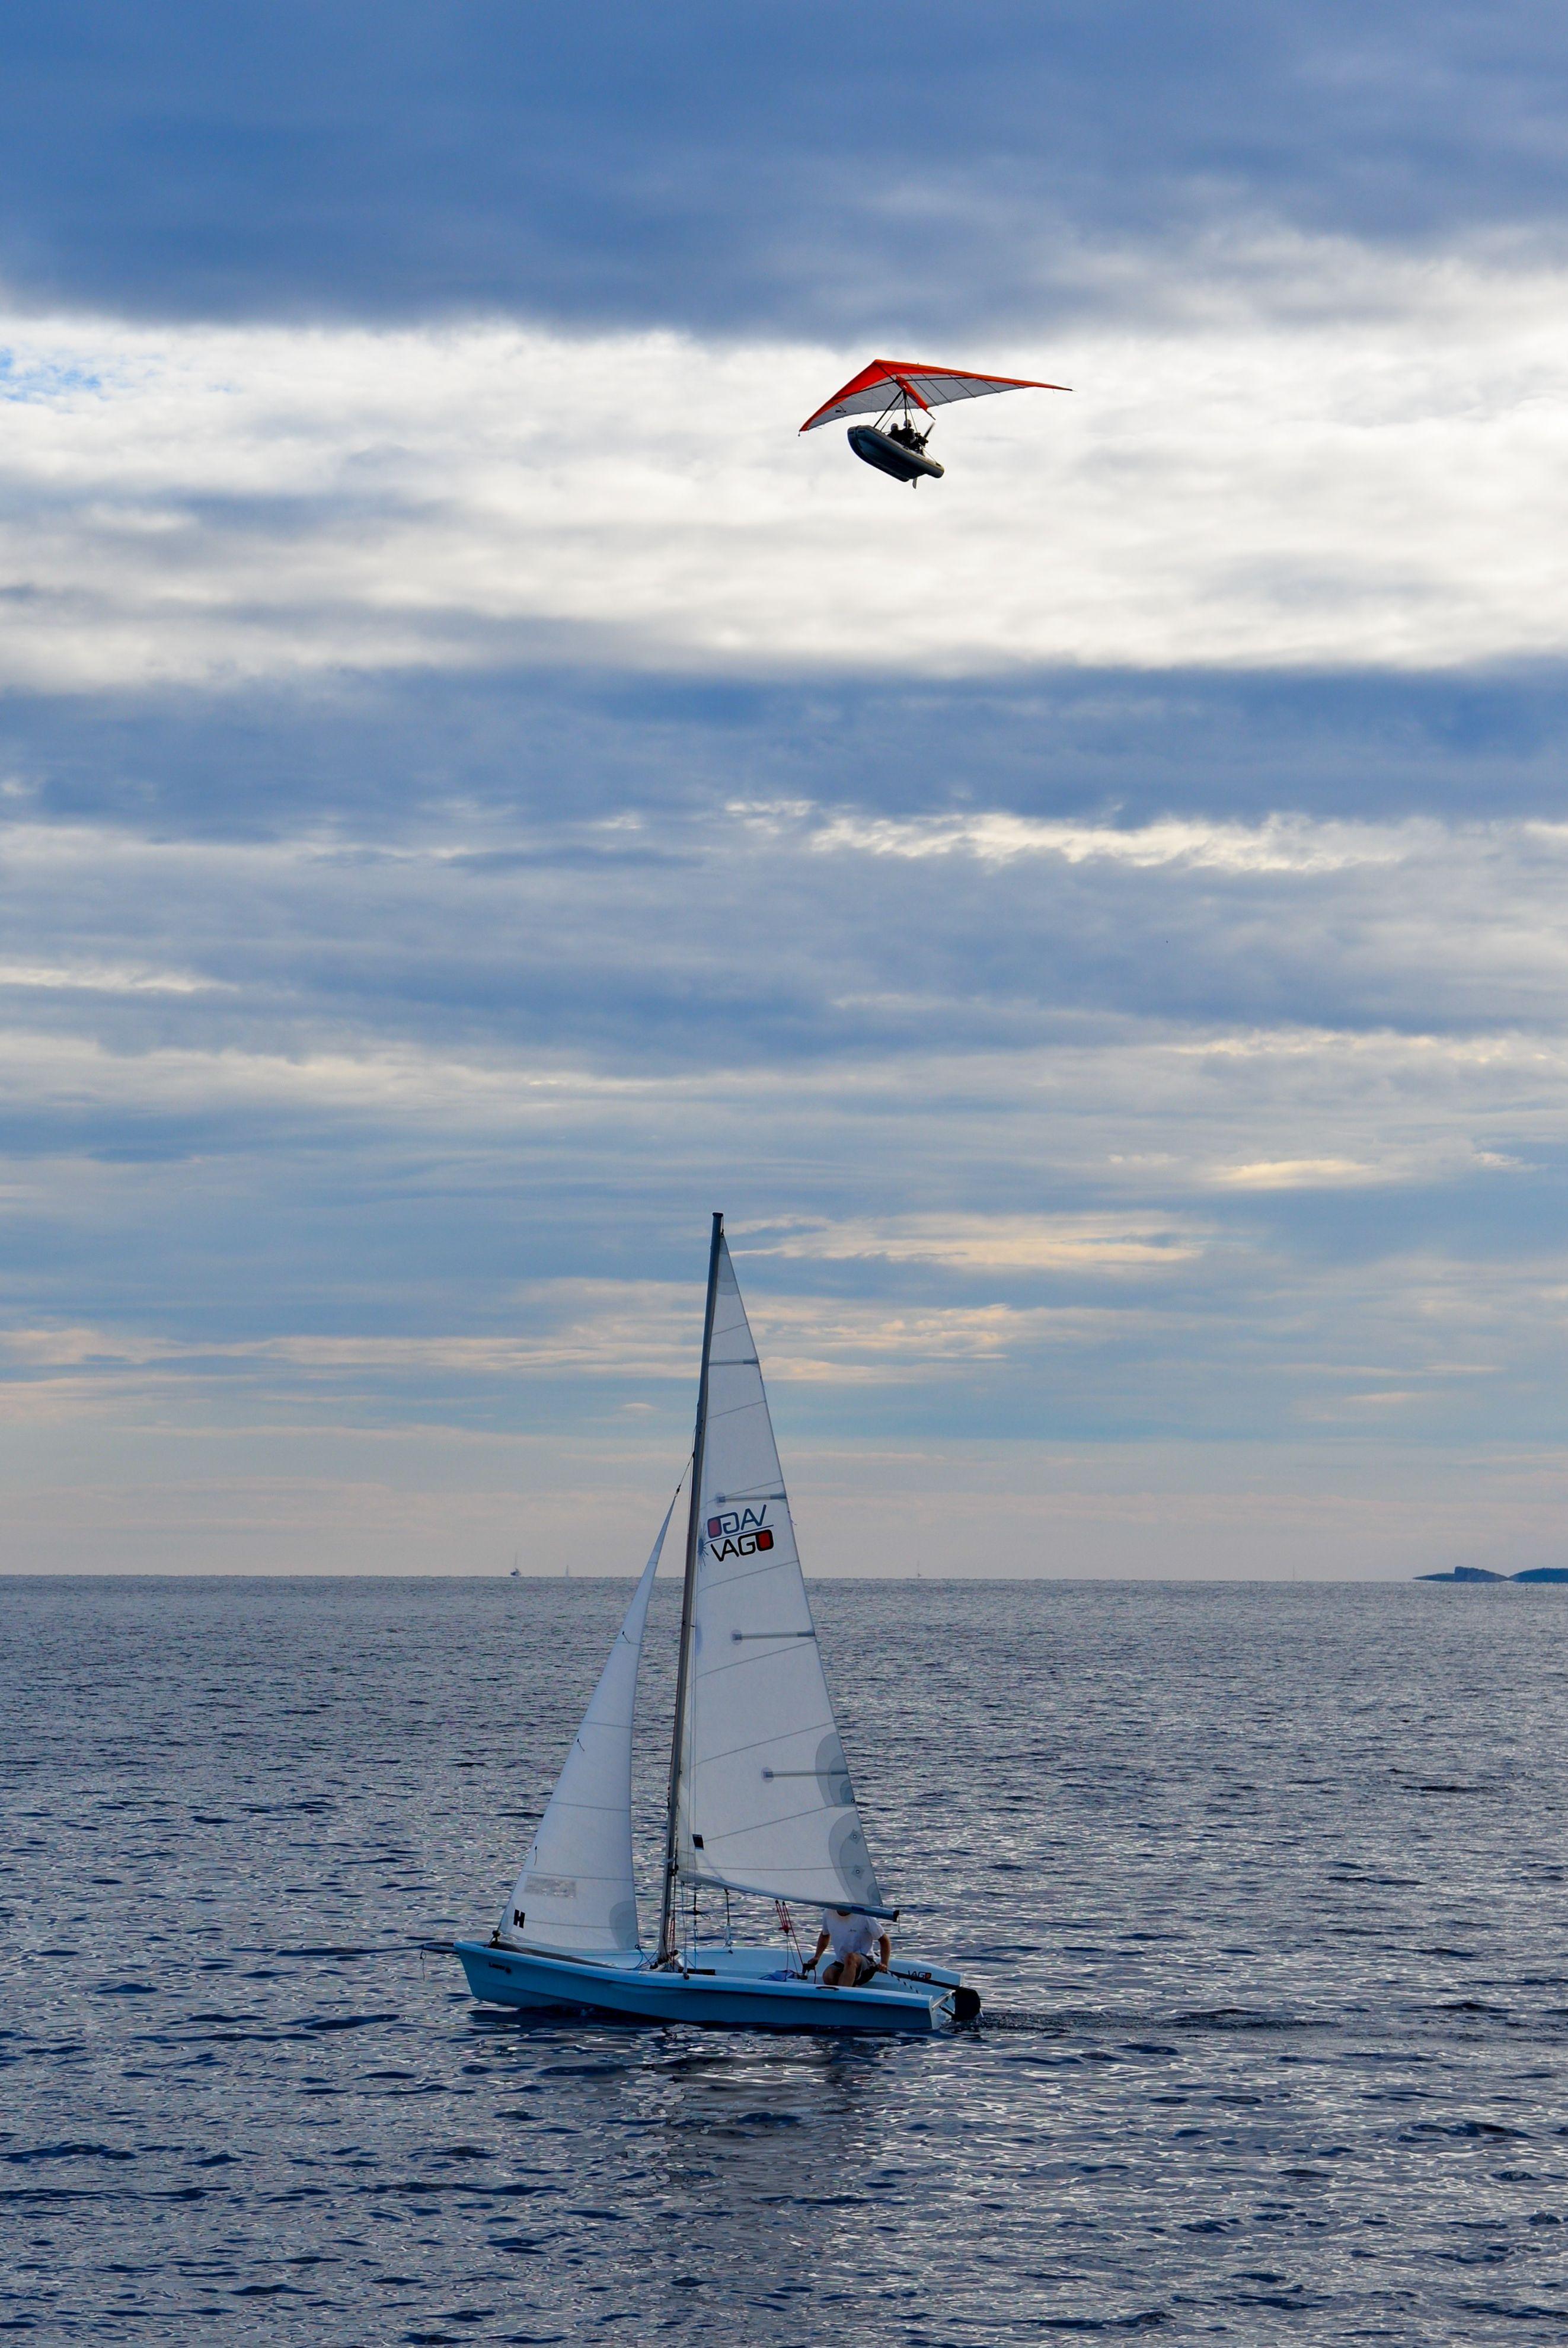 #Sail #boat #deltaplano